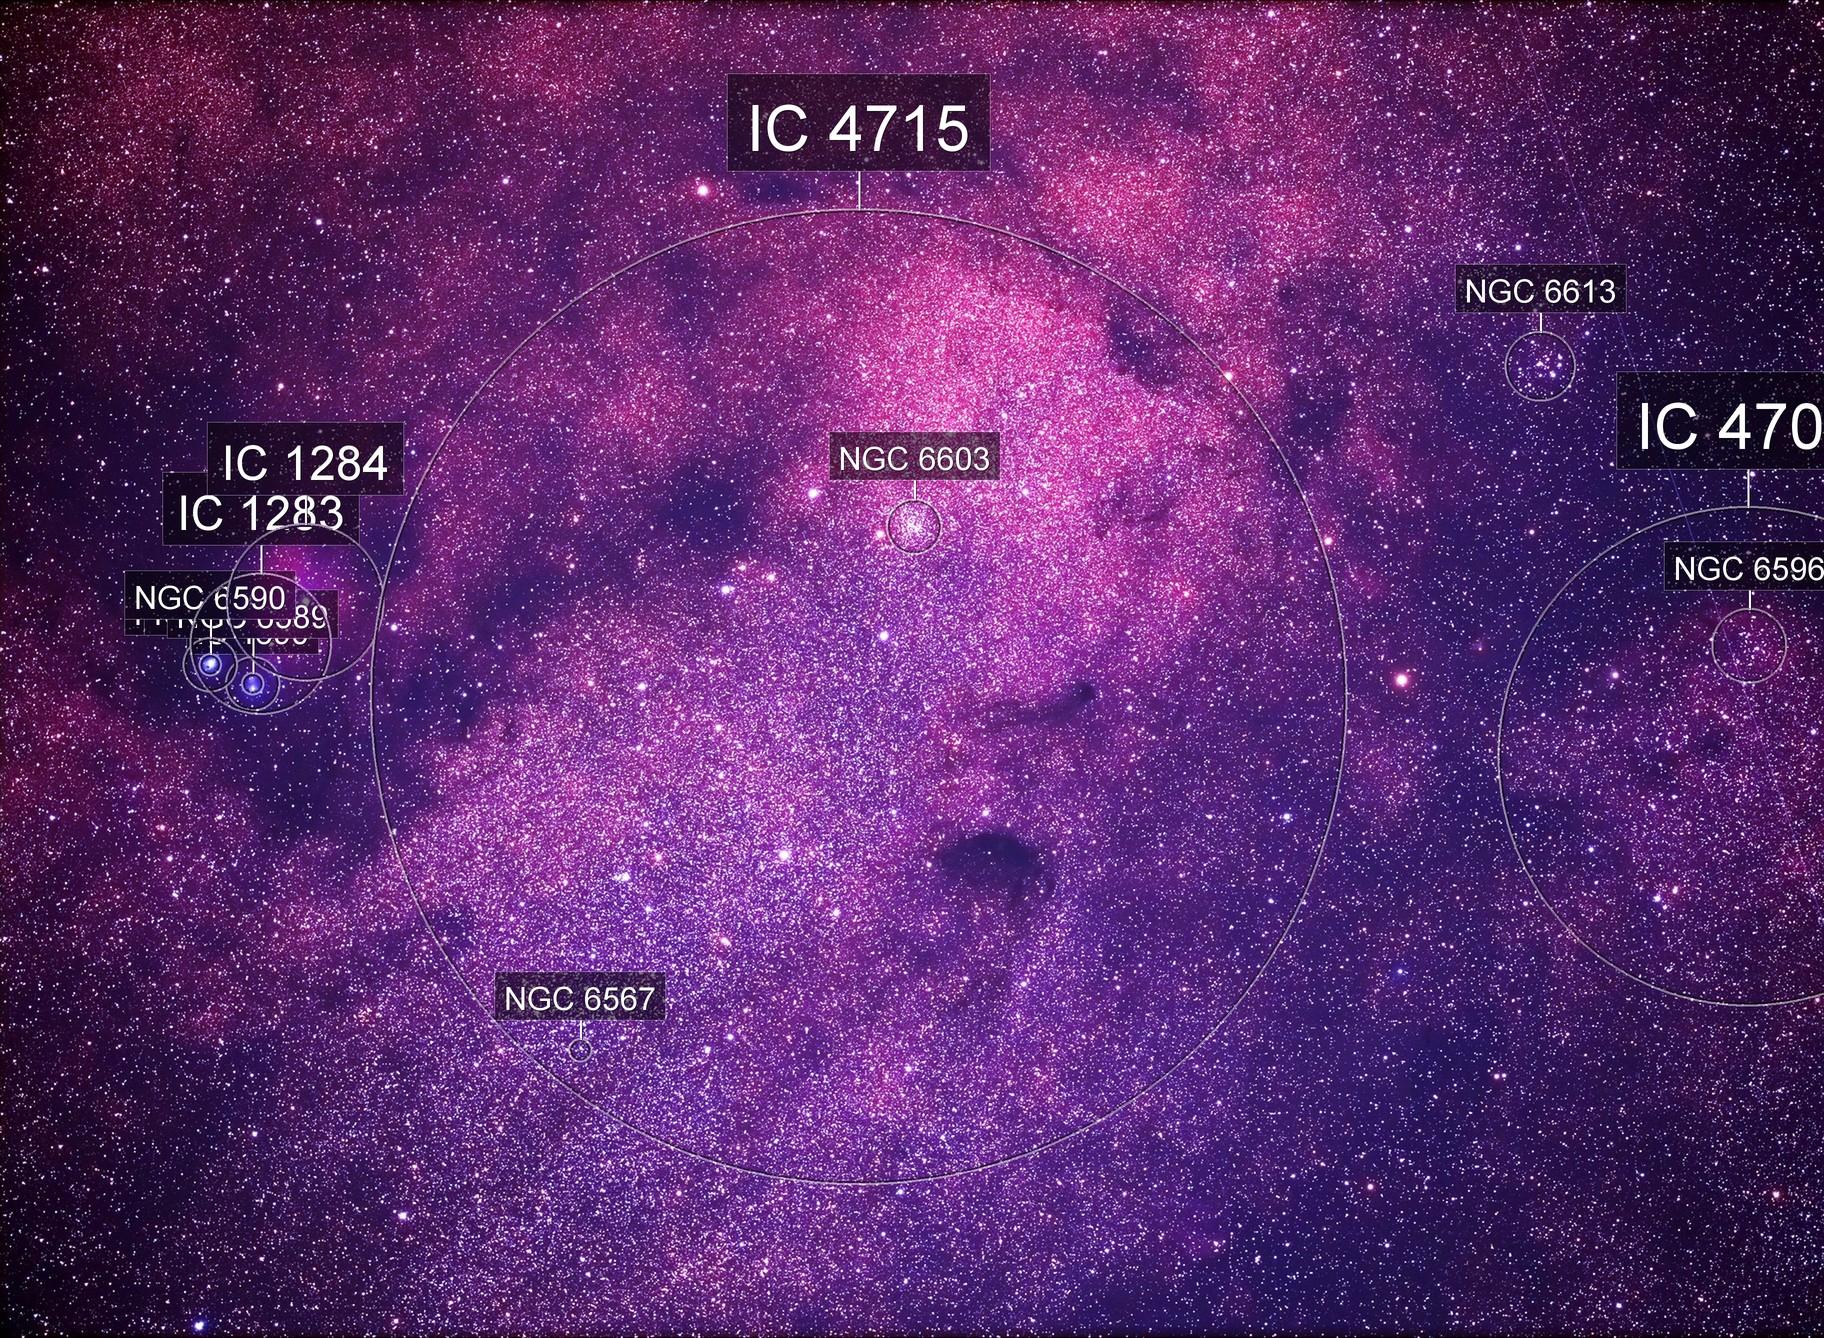 Sagittarius Star Cloud (Messier 24)